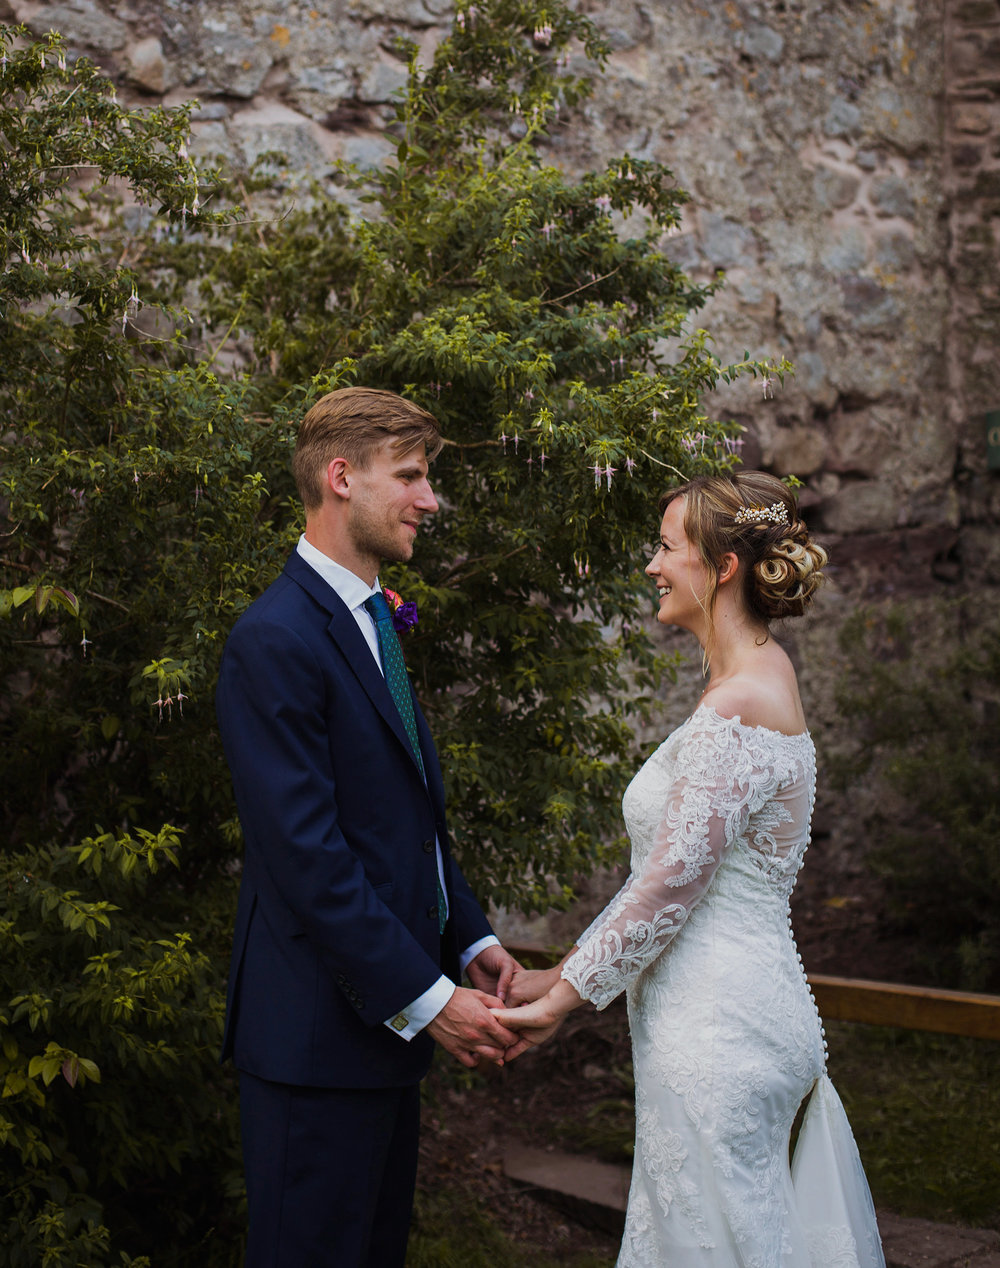 Usk+Castle+Wedding+Pavel+and_Georgina.jpg